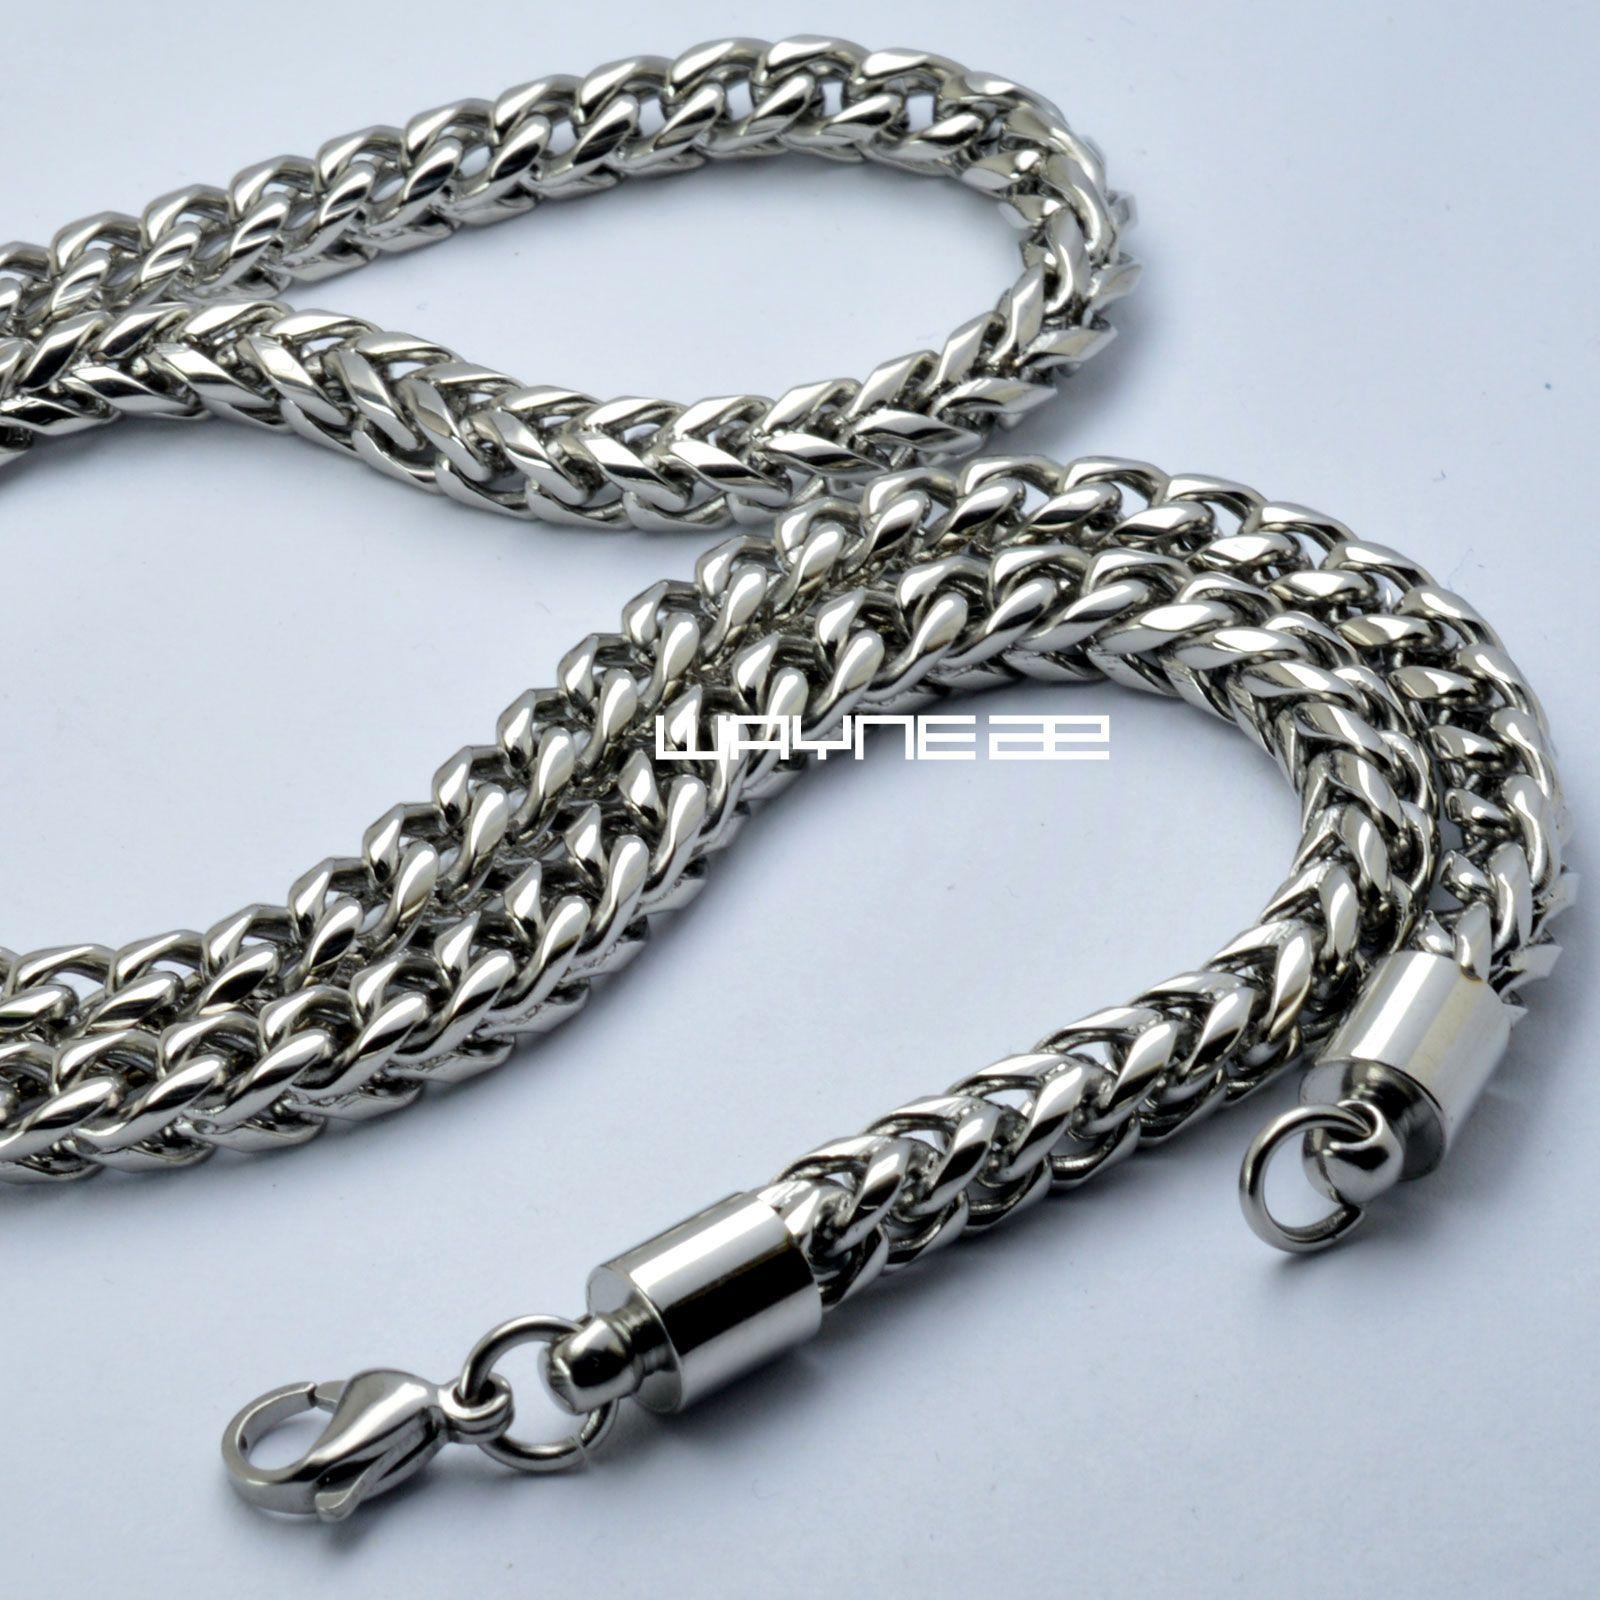 n303-Серебристый тон тяжелый Нержавеющая сталь 23,6 дюйма.